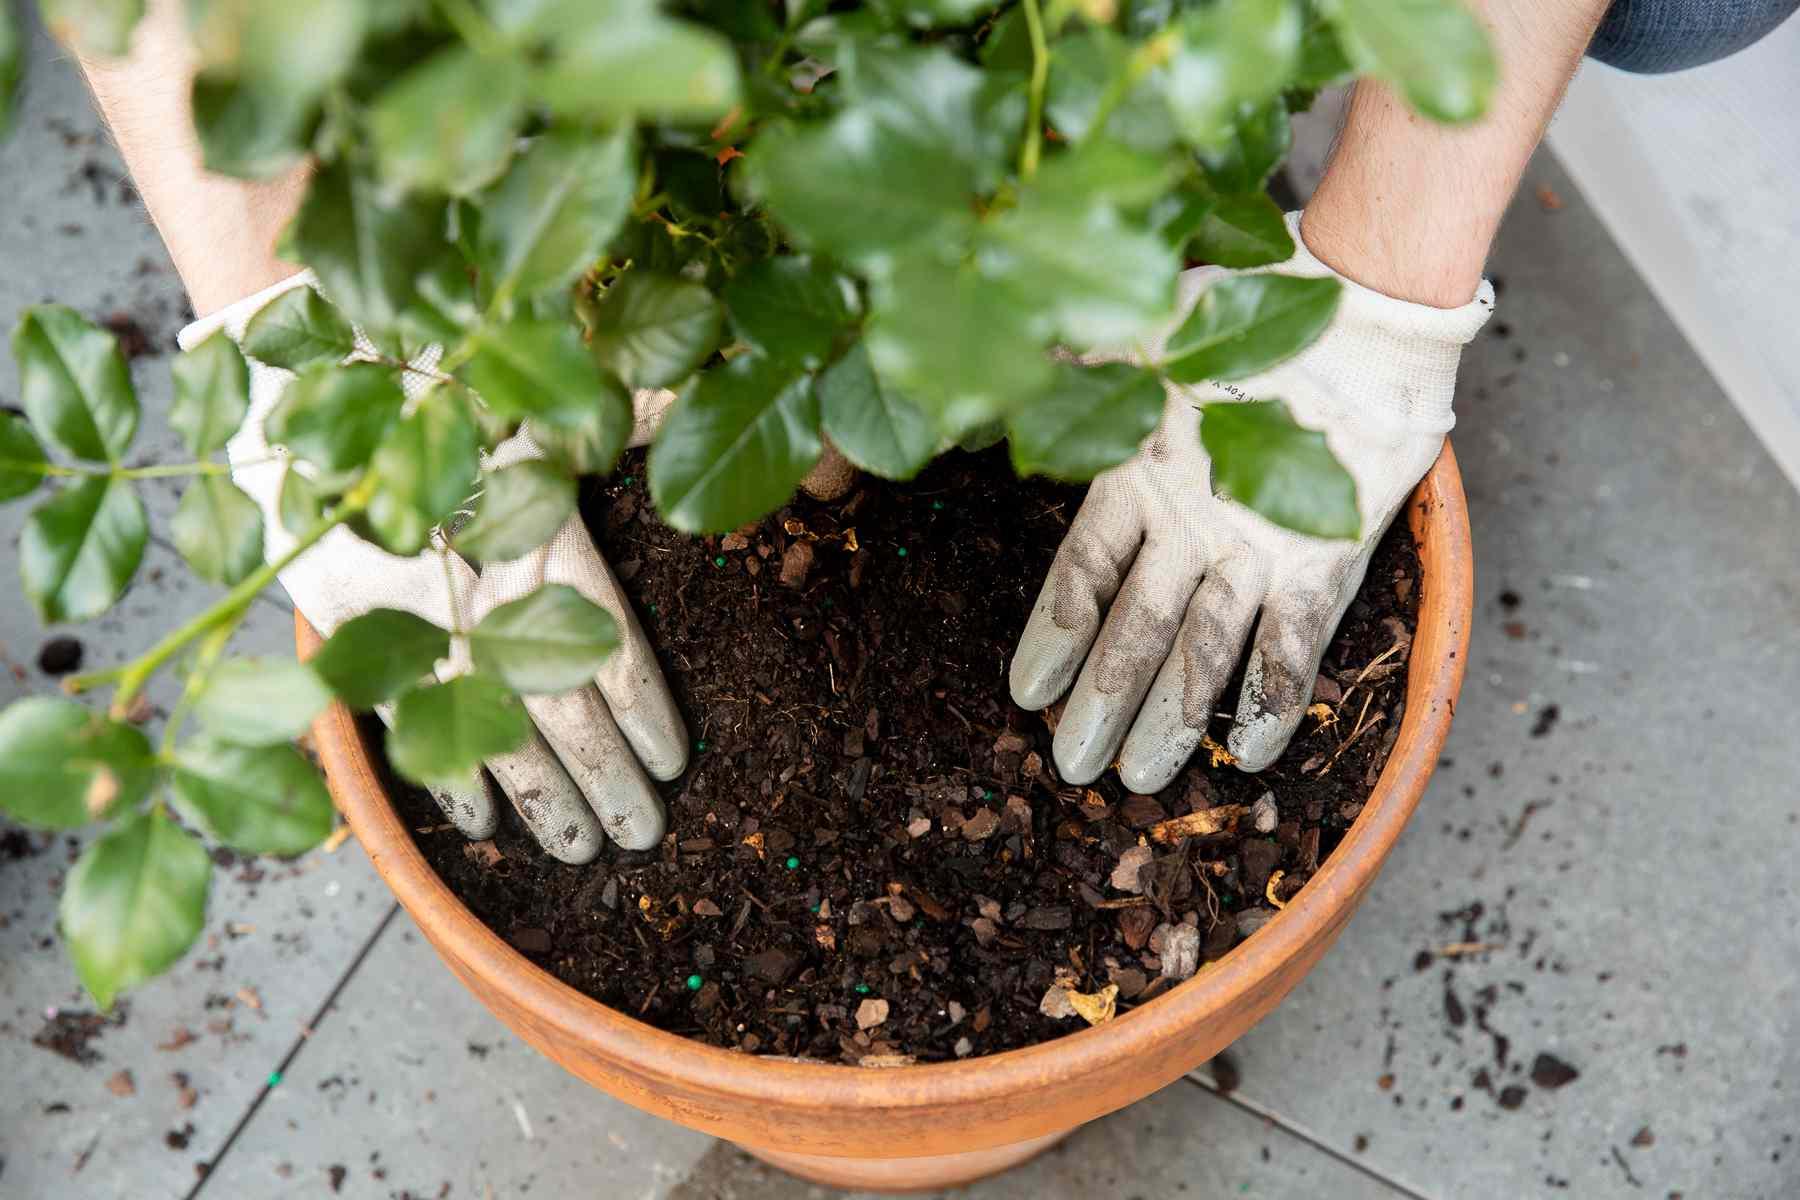 Freshly prepared potting soil covering repotted rose bush